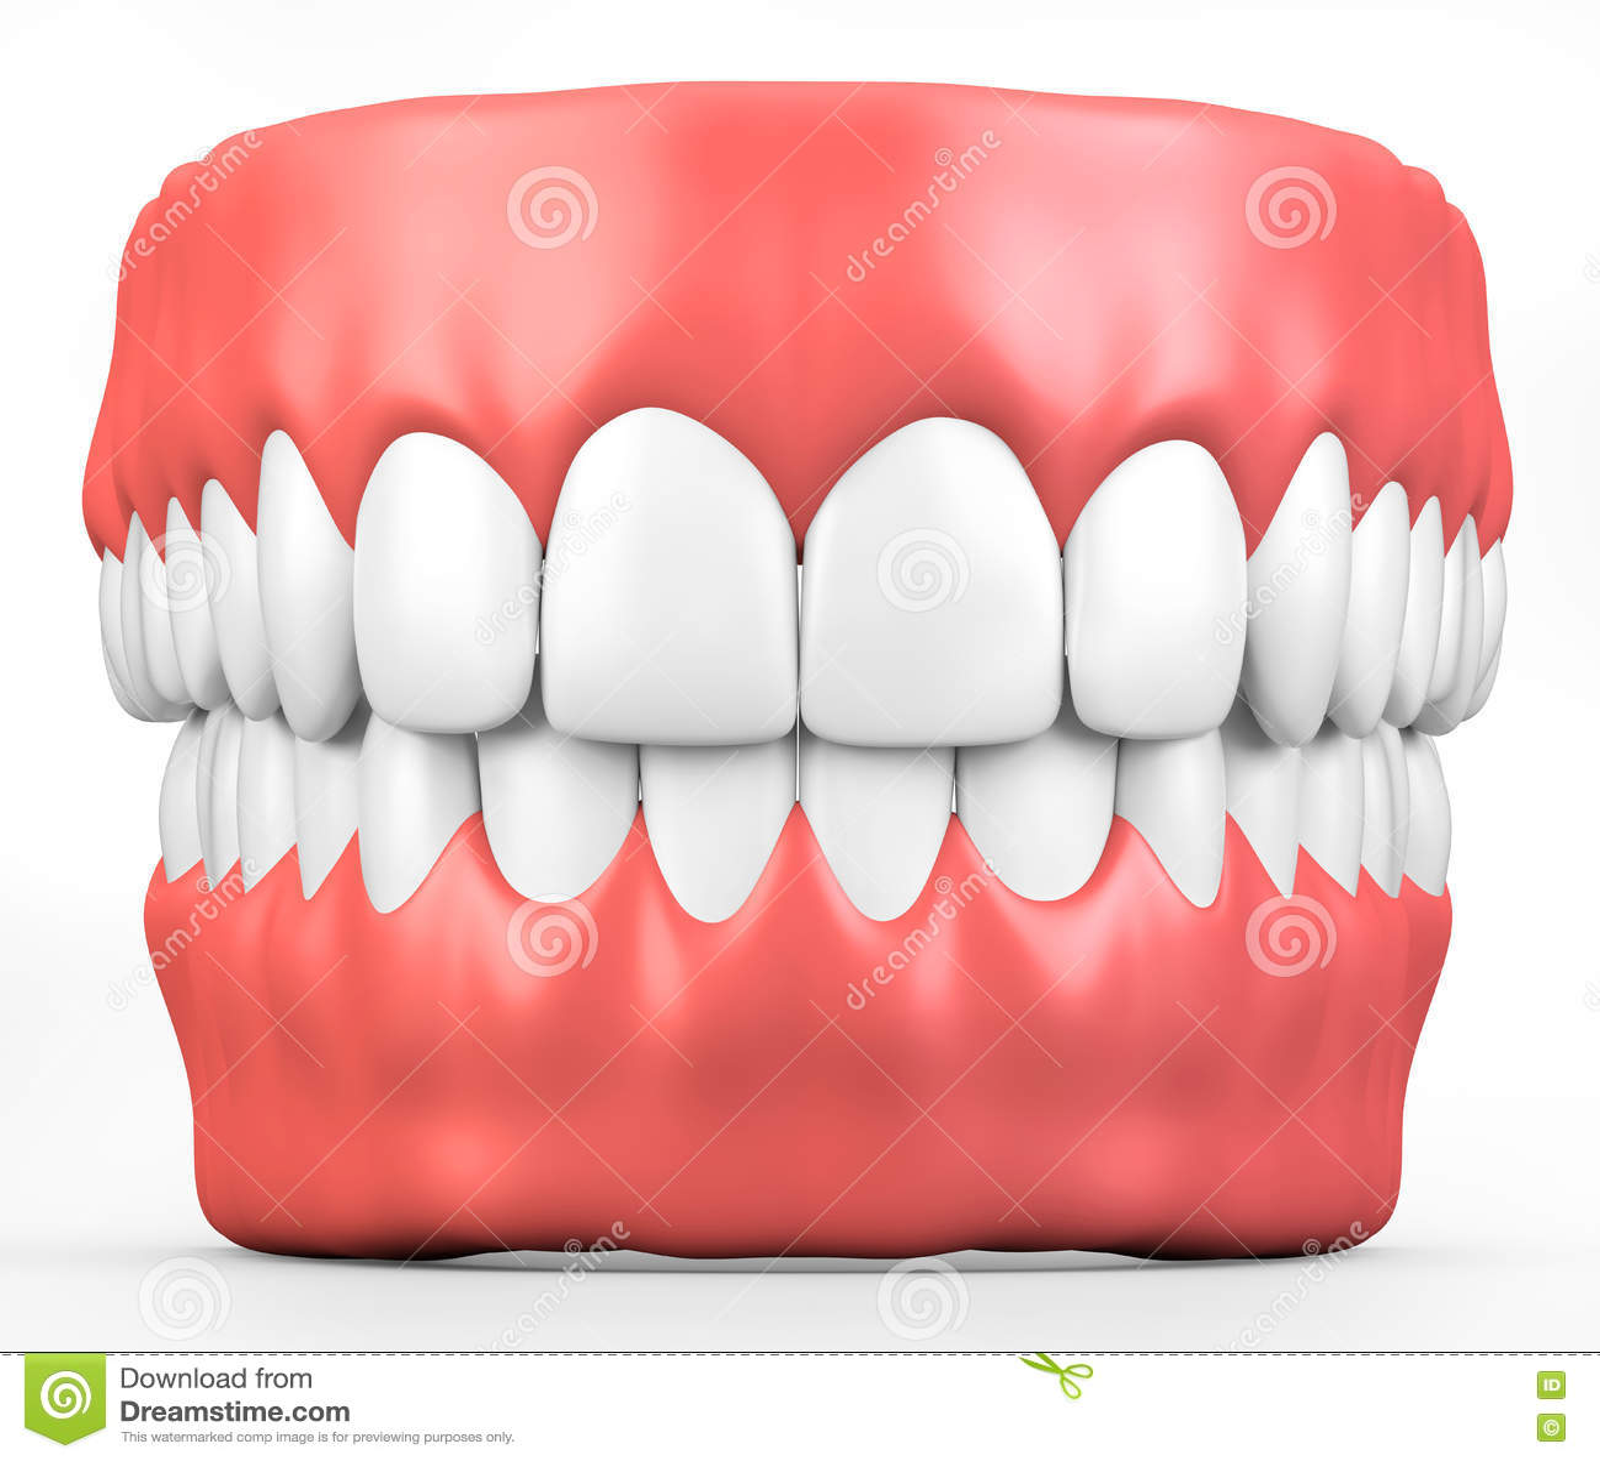 3d Illustration Teeth And Gum Model Stock Illustration